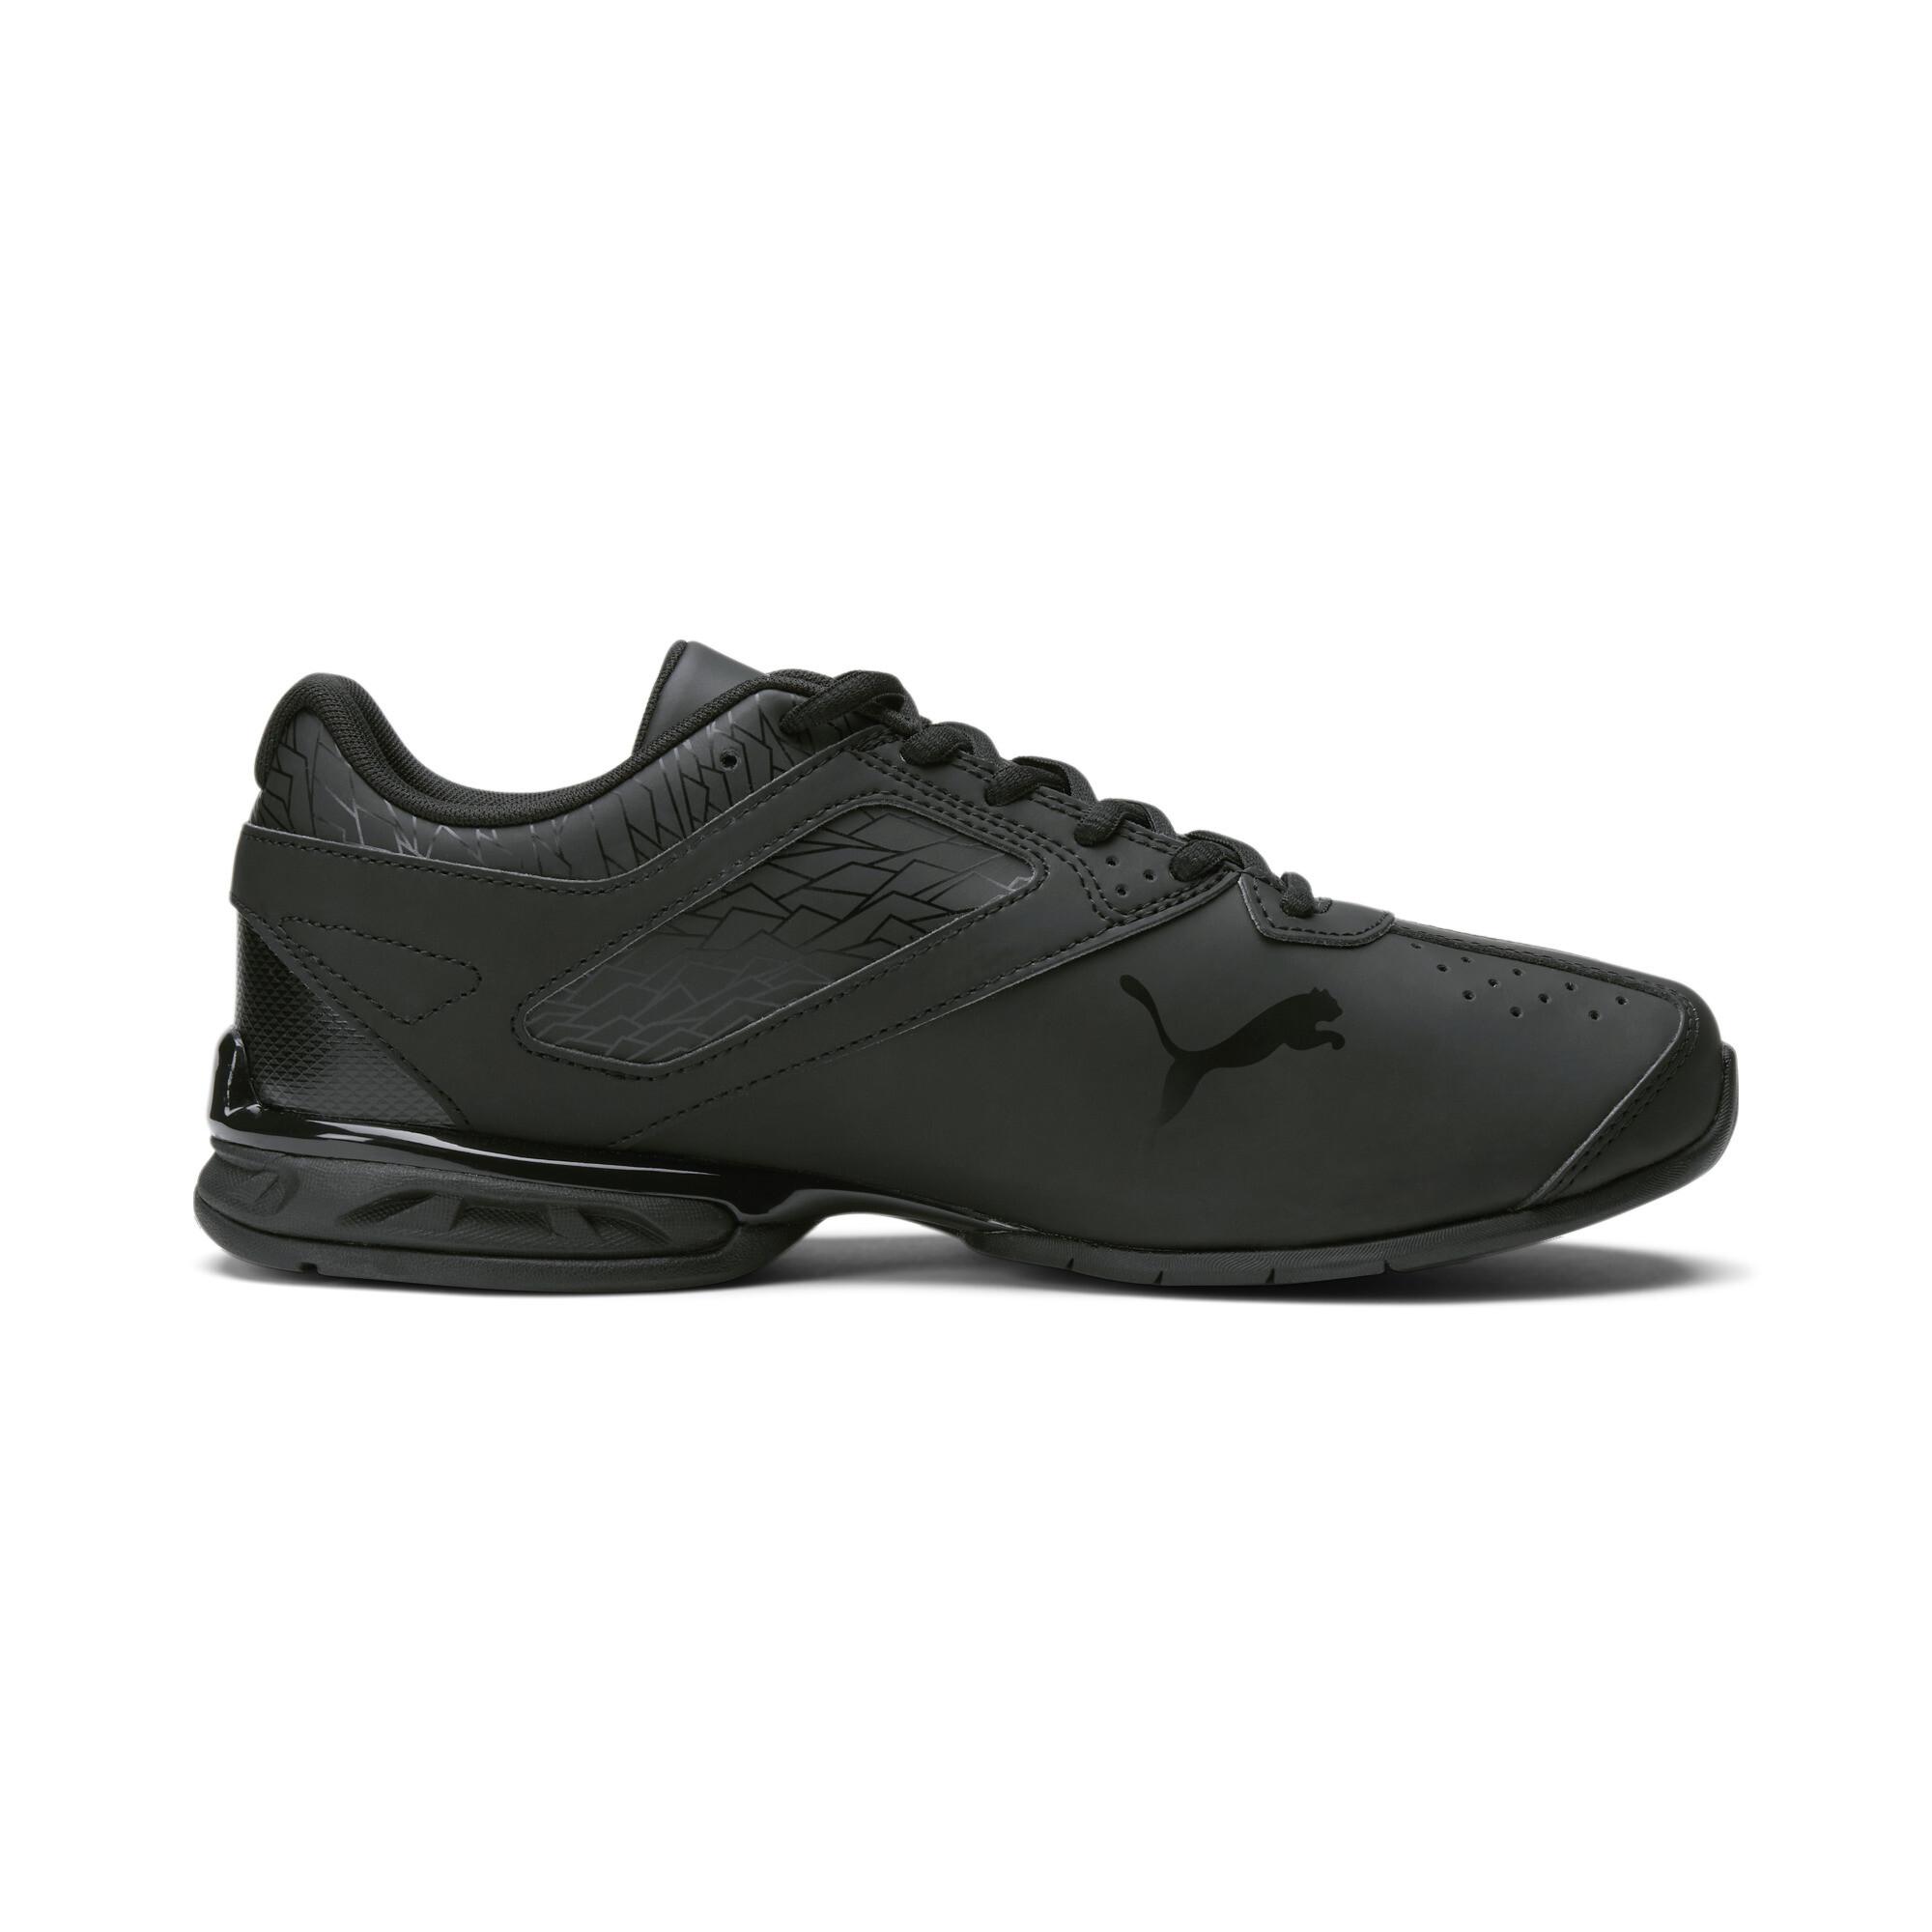 thumbnail 11 - PUMA Men's Tazon 6 Fracture FM Sneakers